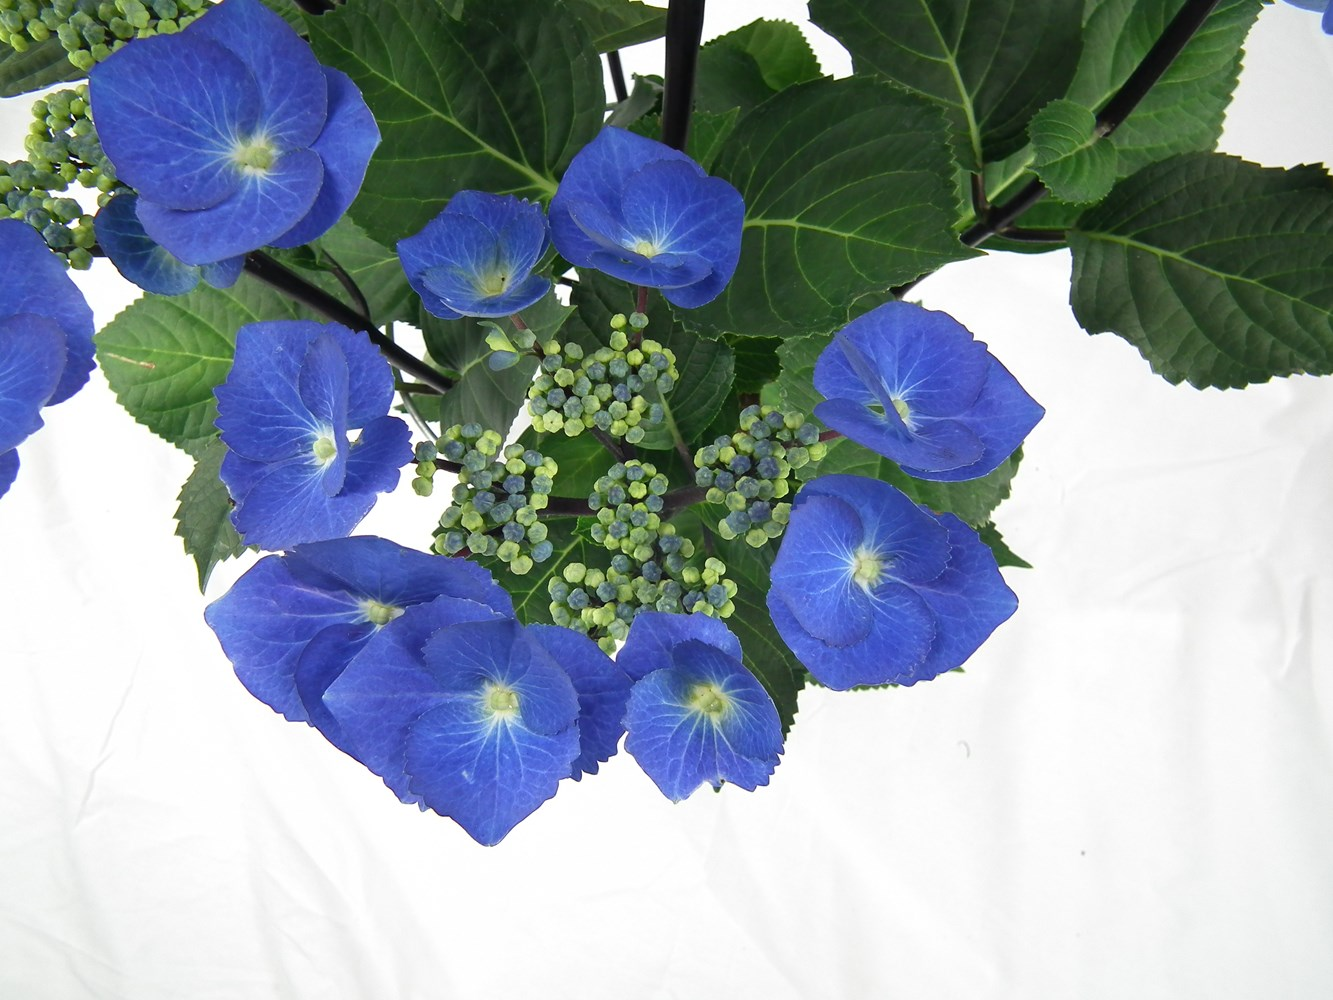 Website/Plants/2144398571/Images/Gallery/h_blacklace_02.0.JPG